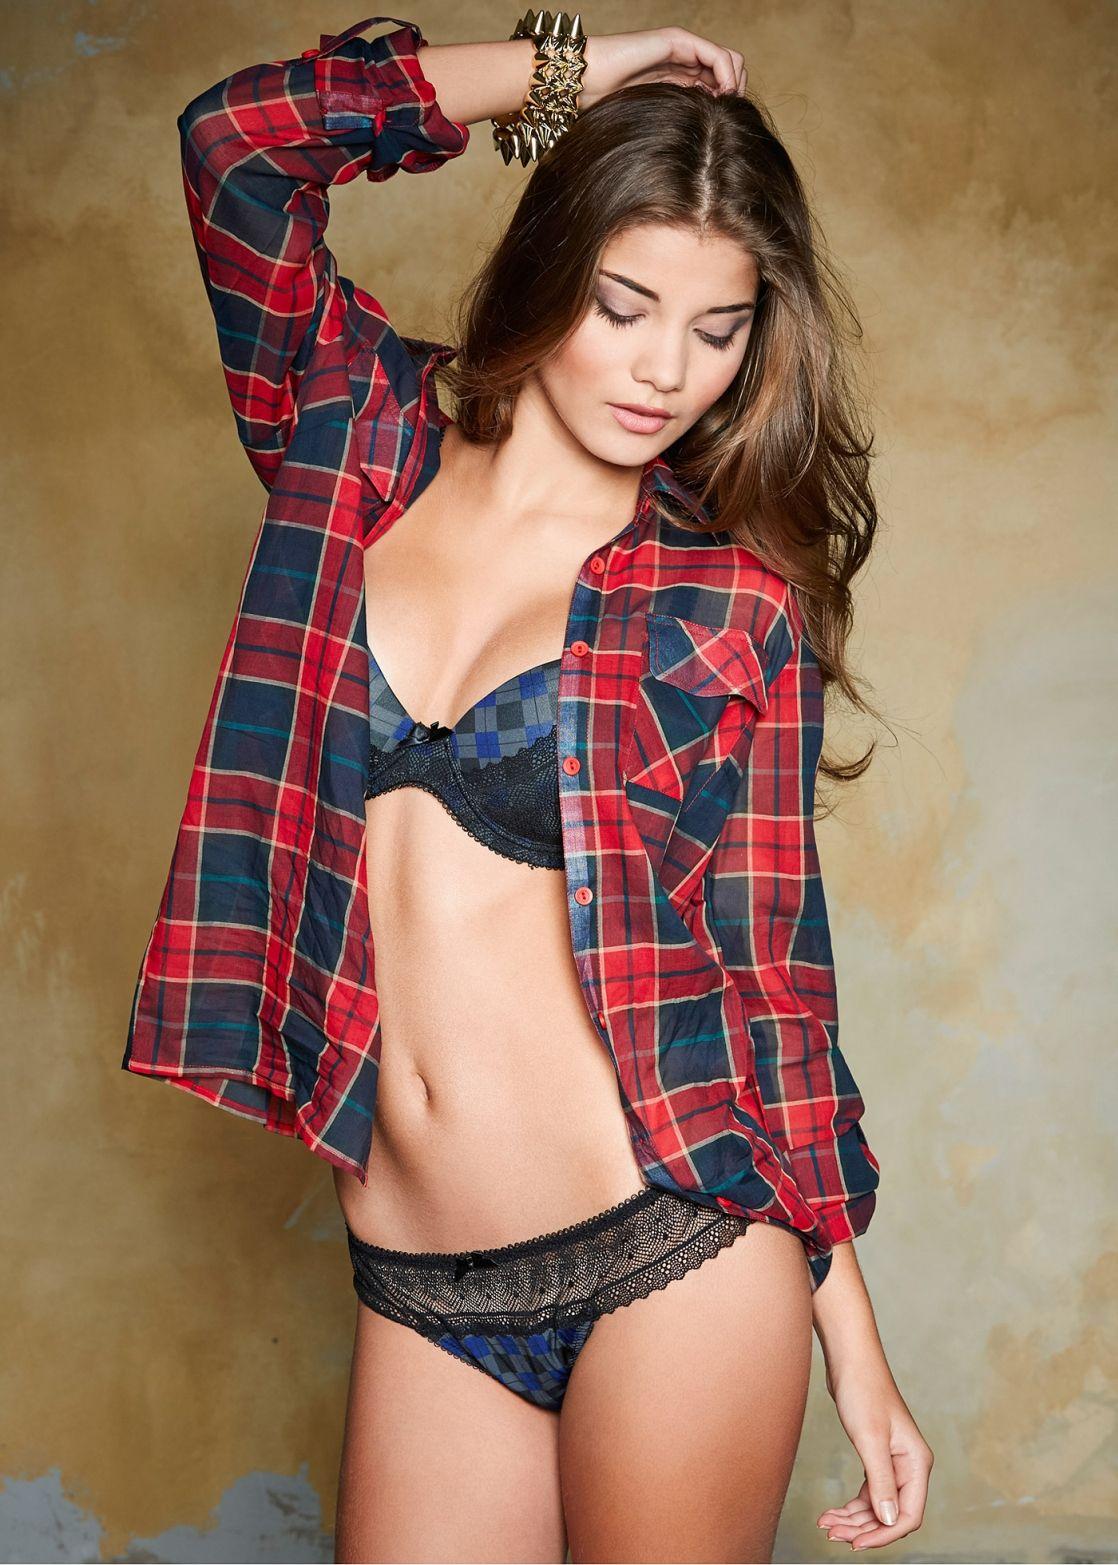 Flannel lingerie comfy bralette color options new